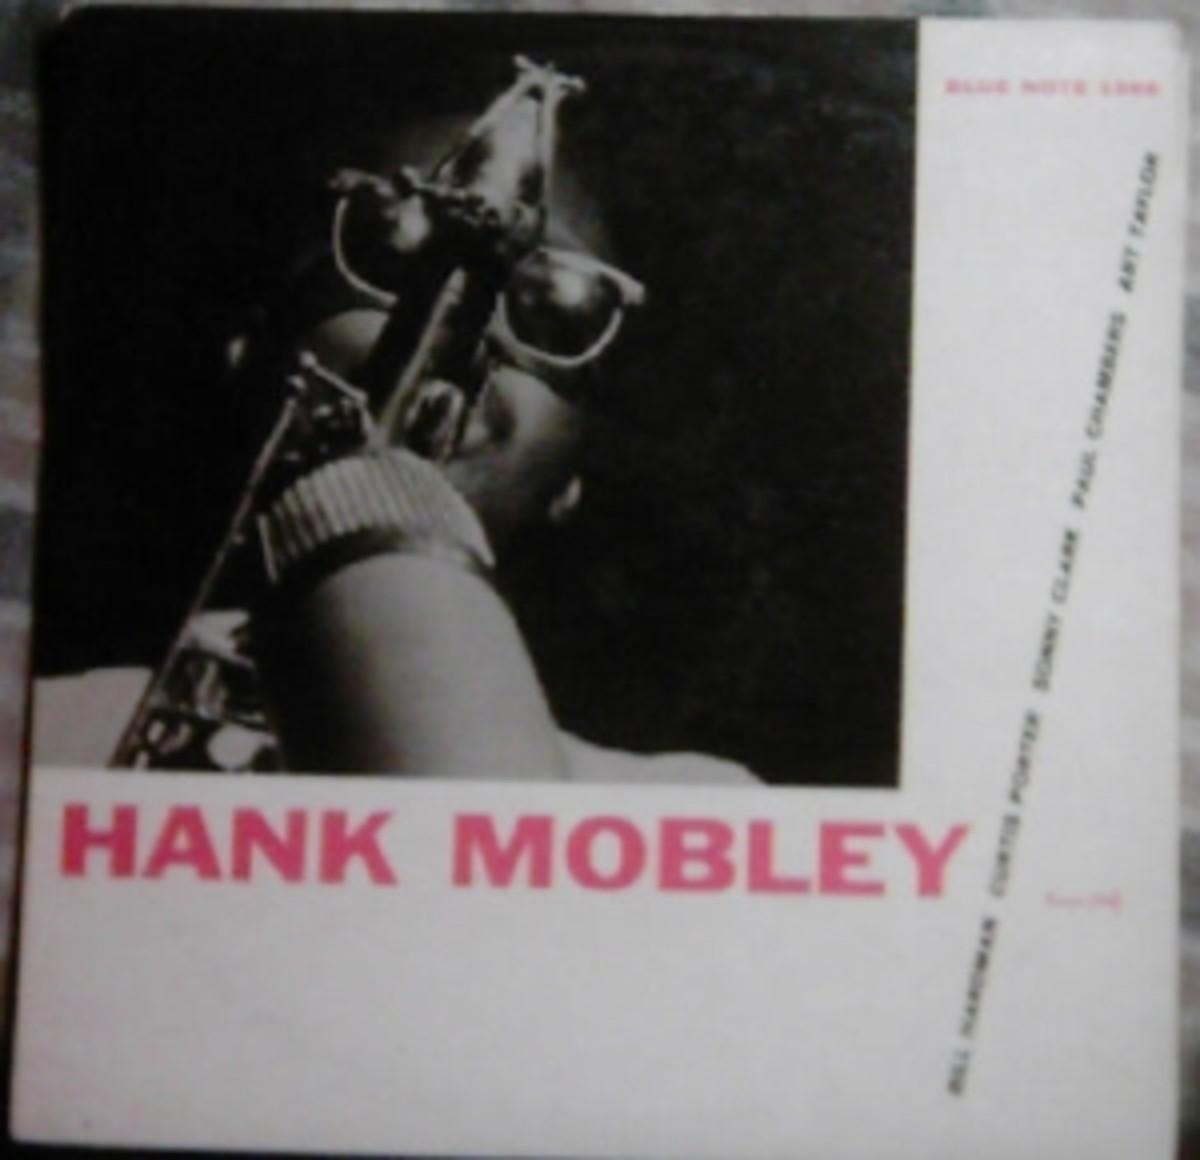 Hank-Mobley-vinyl-record